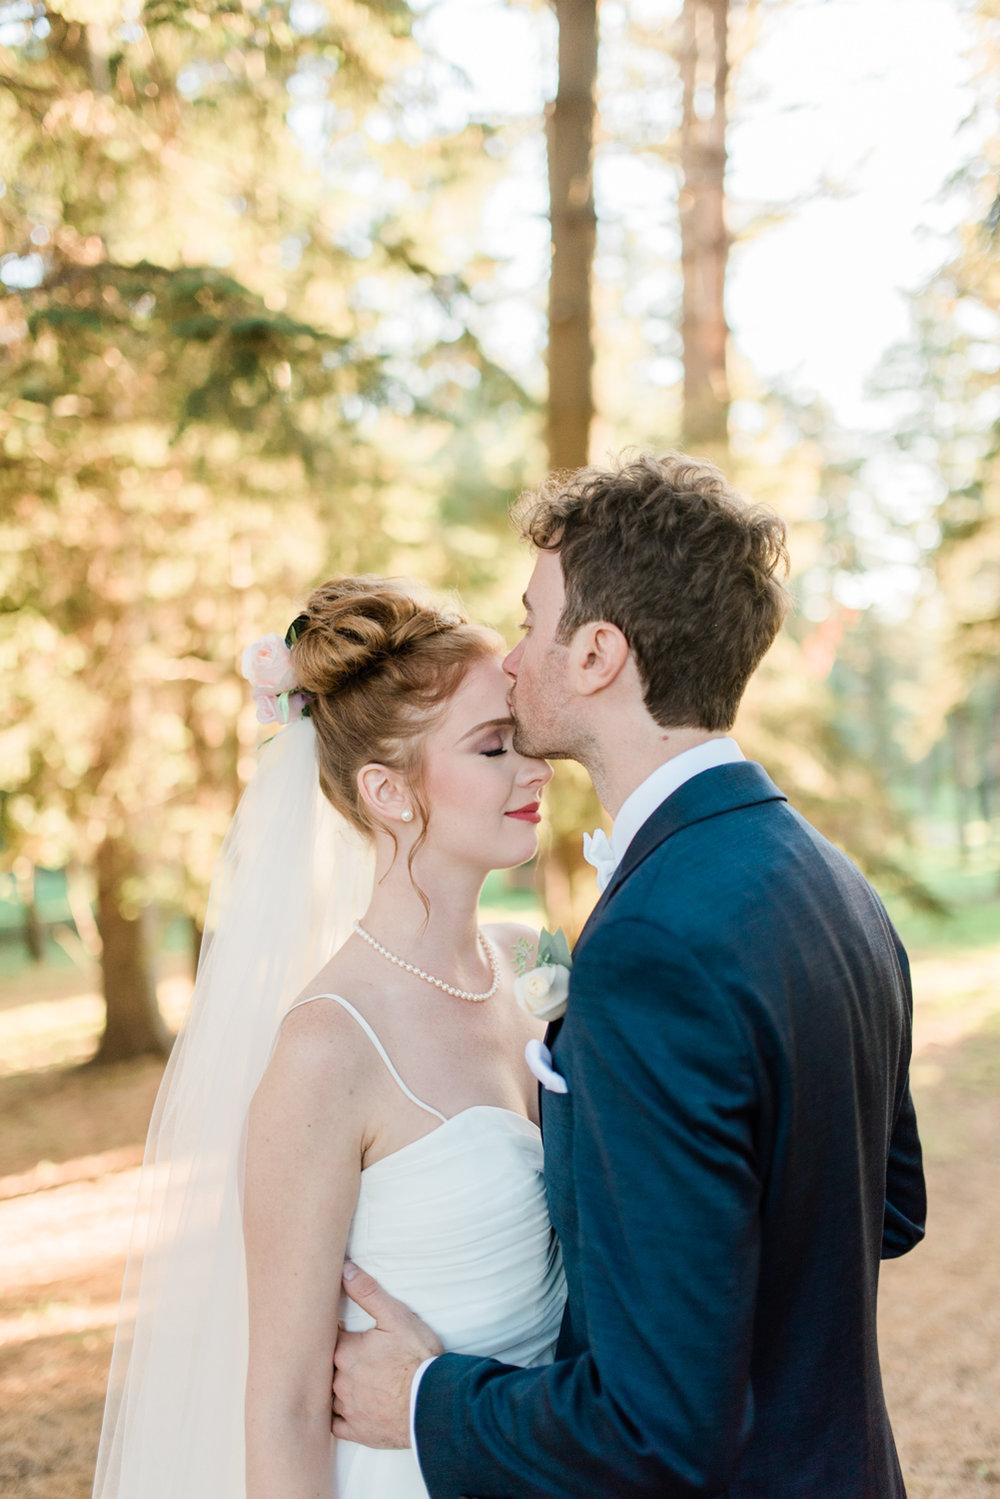 Hamilton Destination Wedding Photographer -79.jpg